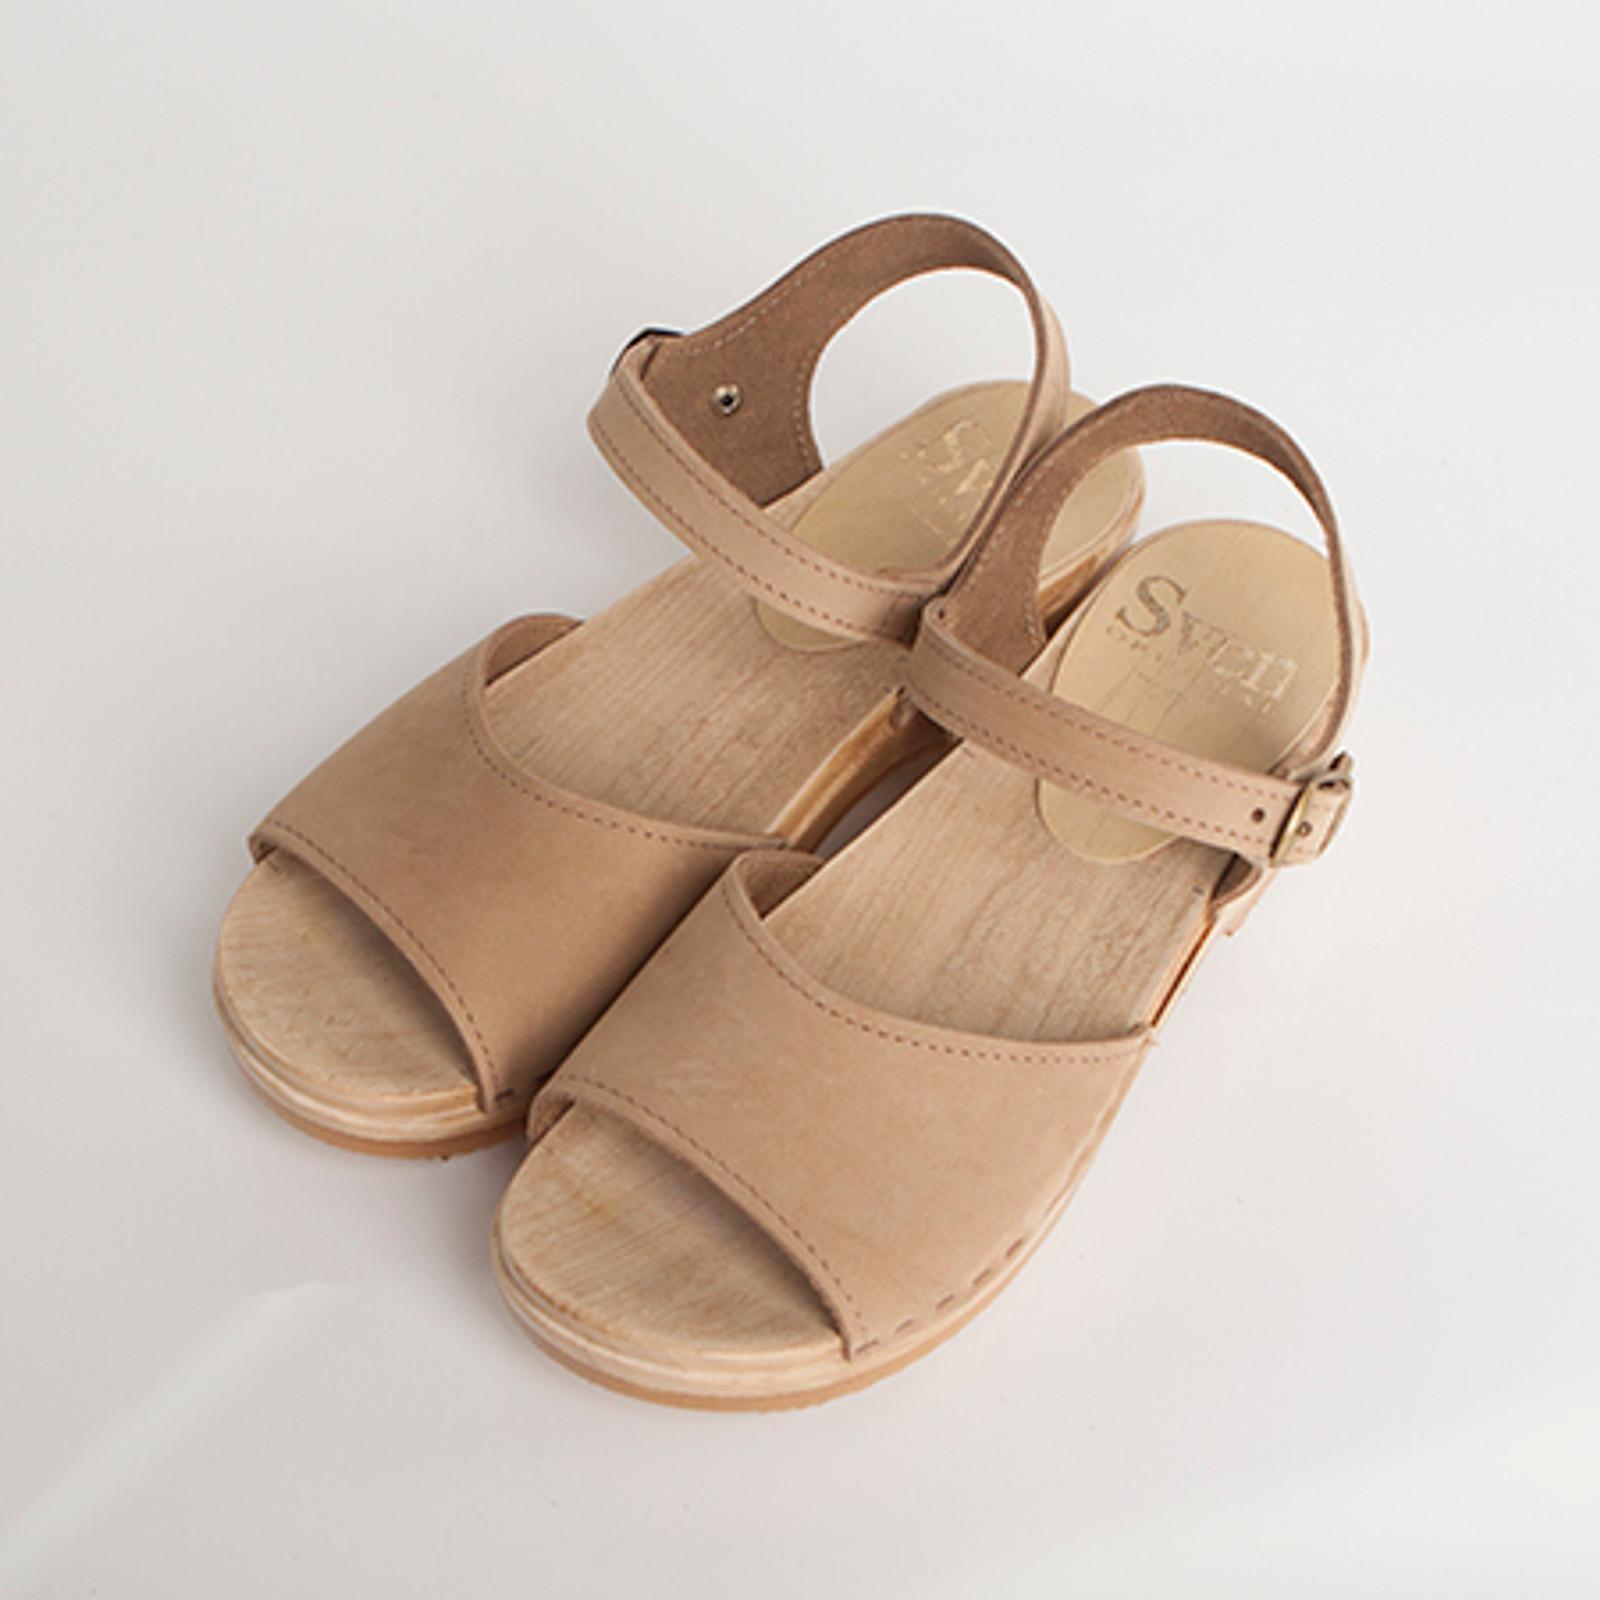 Open Toe Sandal Clogs